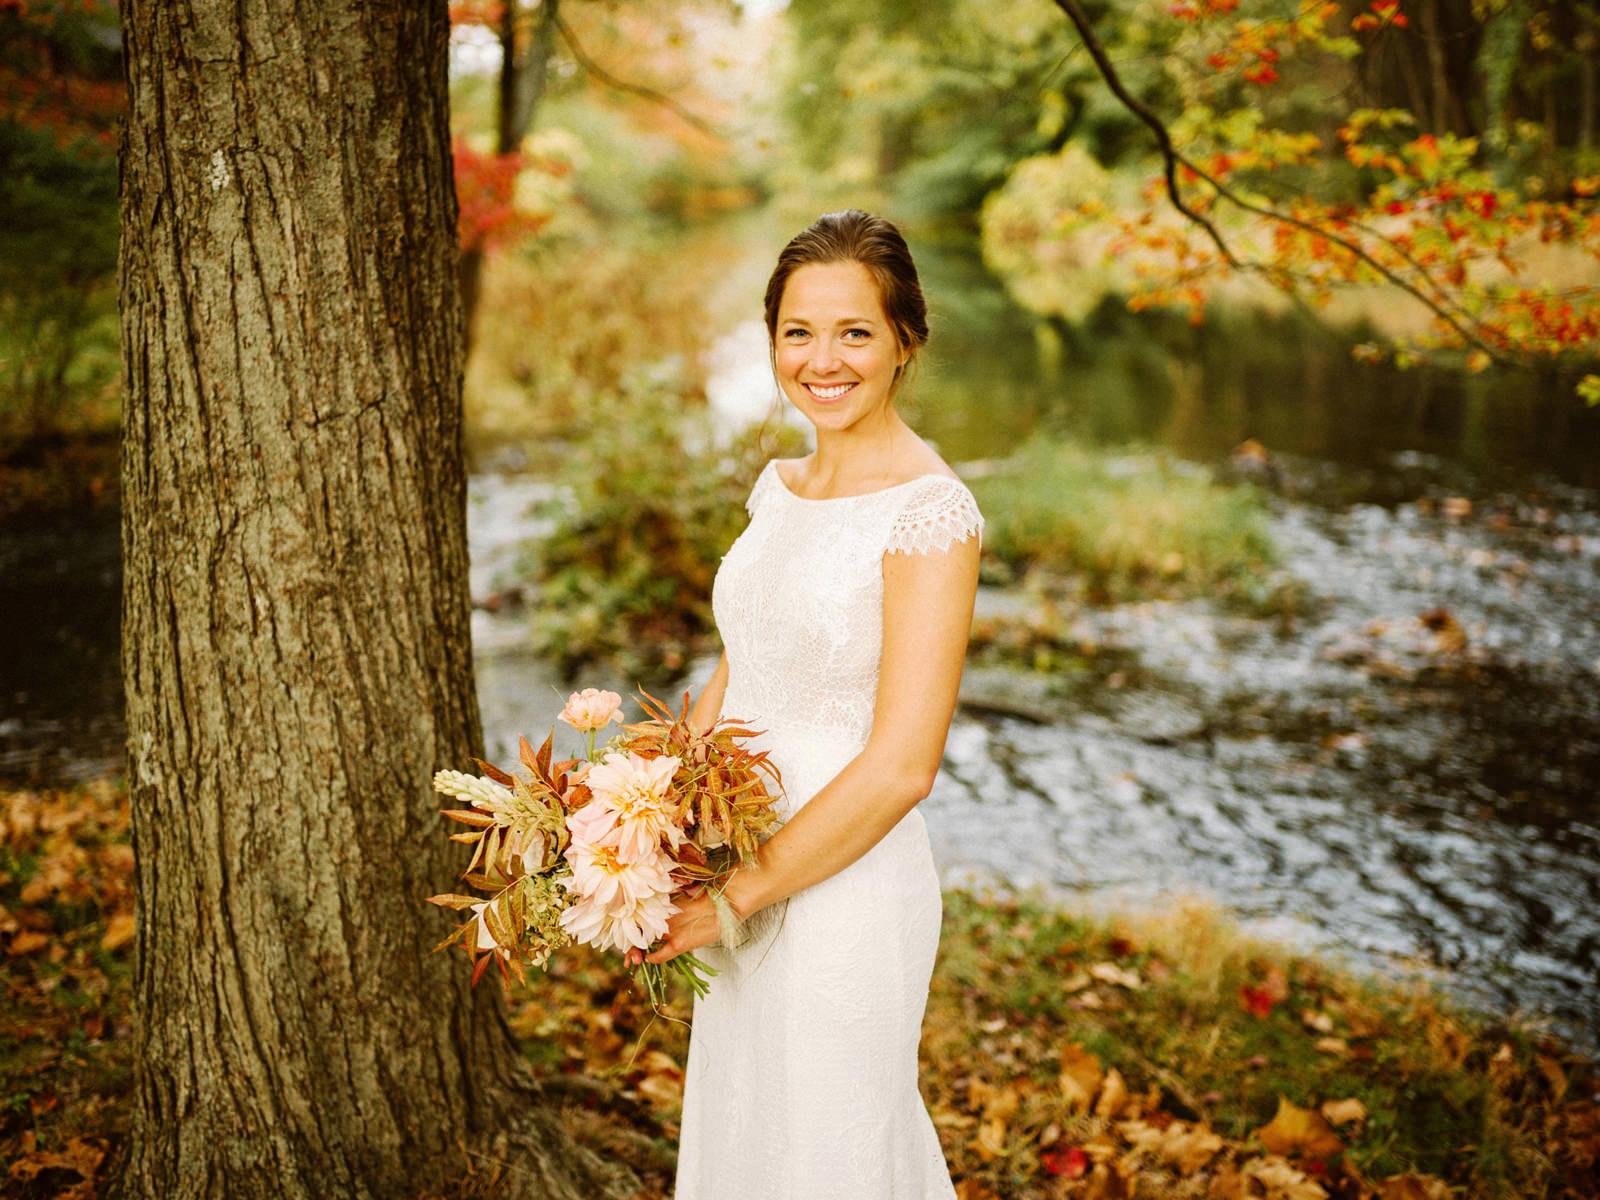 bridgeport-wedding-107 BRIDGEPORT, CONNECTICUT BACKYARD WEDDING